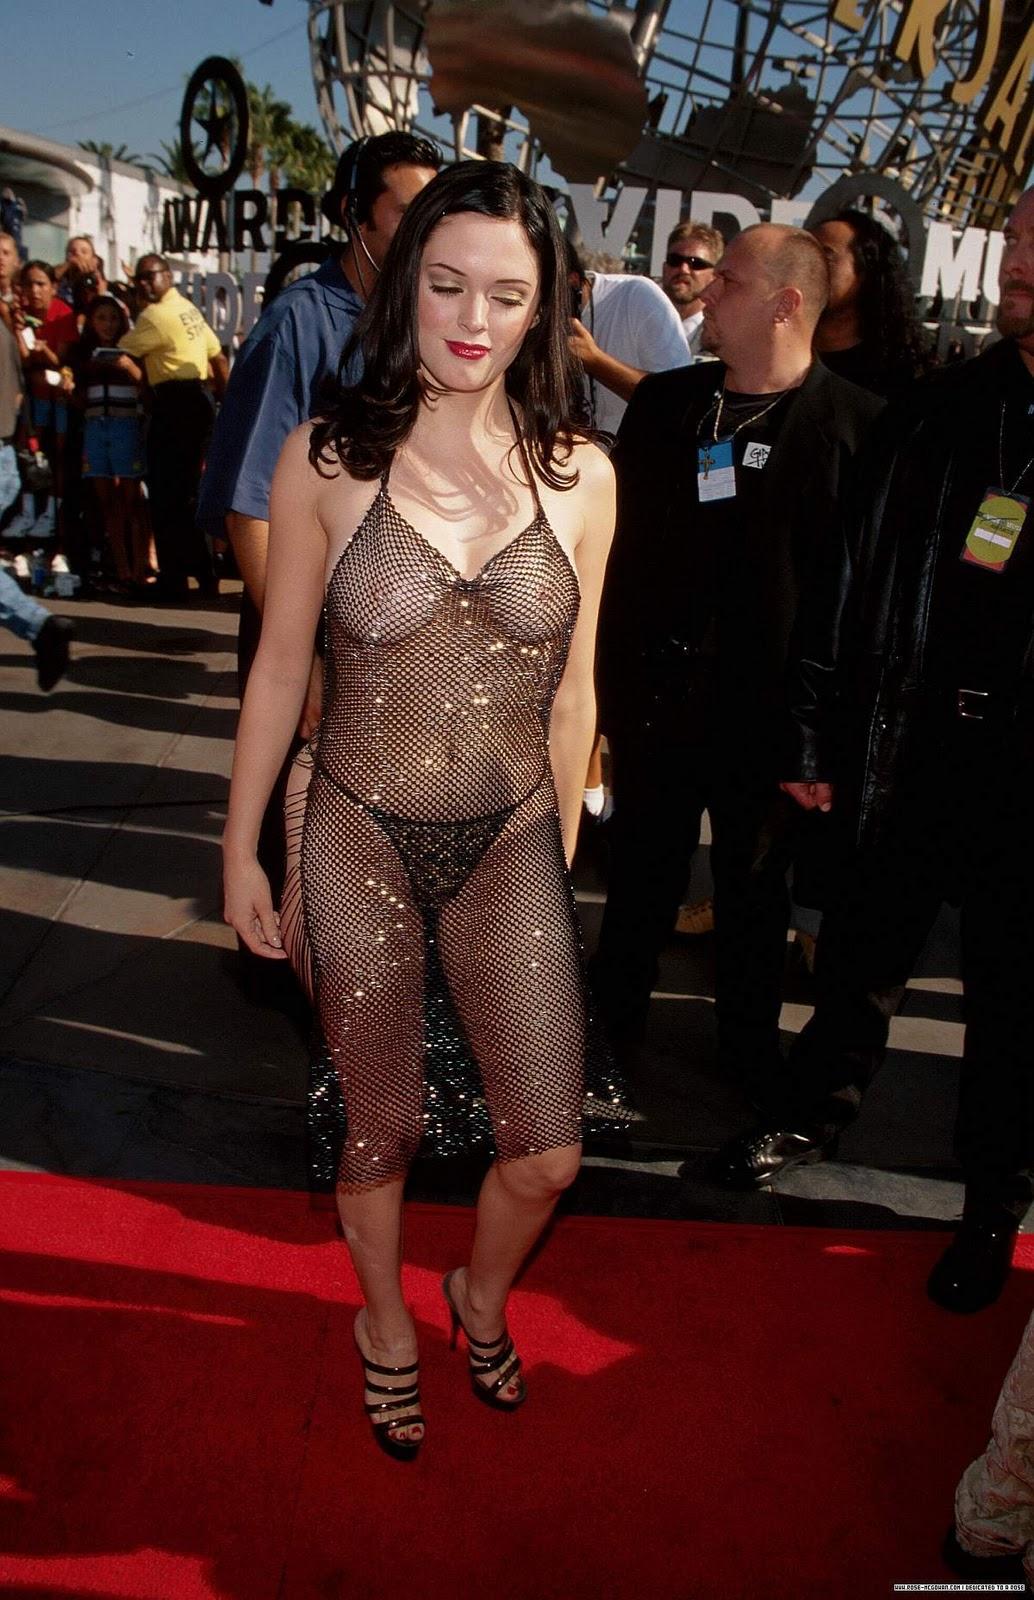 http://1.bp.blogspot.com/_VSTMcSdB3rA/TSKHq7fz7AI/AAAAAAAAA6E/-5cEZba-I8I/s1600/Rose-at-1998-MTV-music-Awards-rose-mcgowan-8217022-1200-1856.jpg